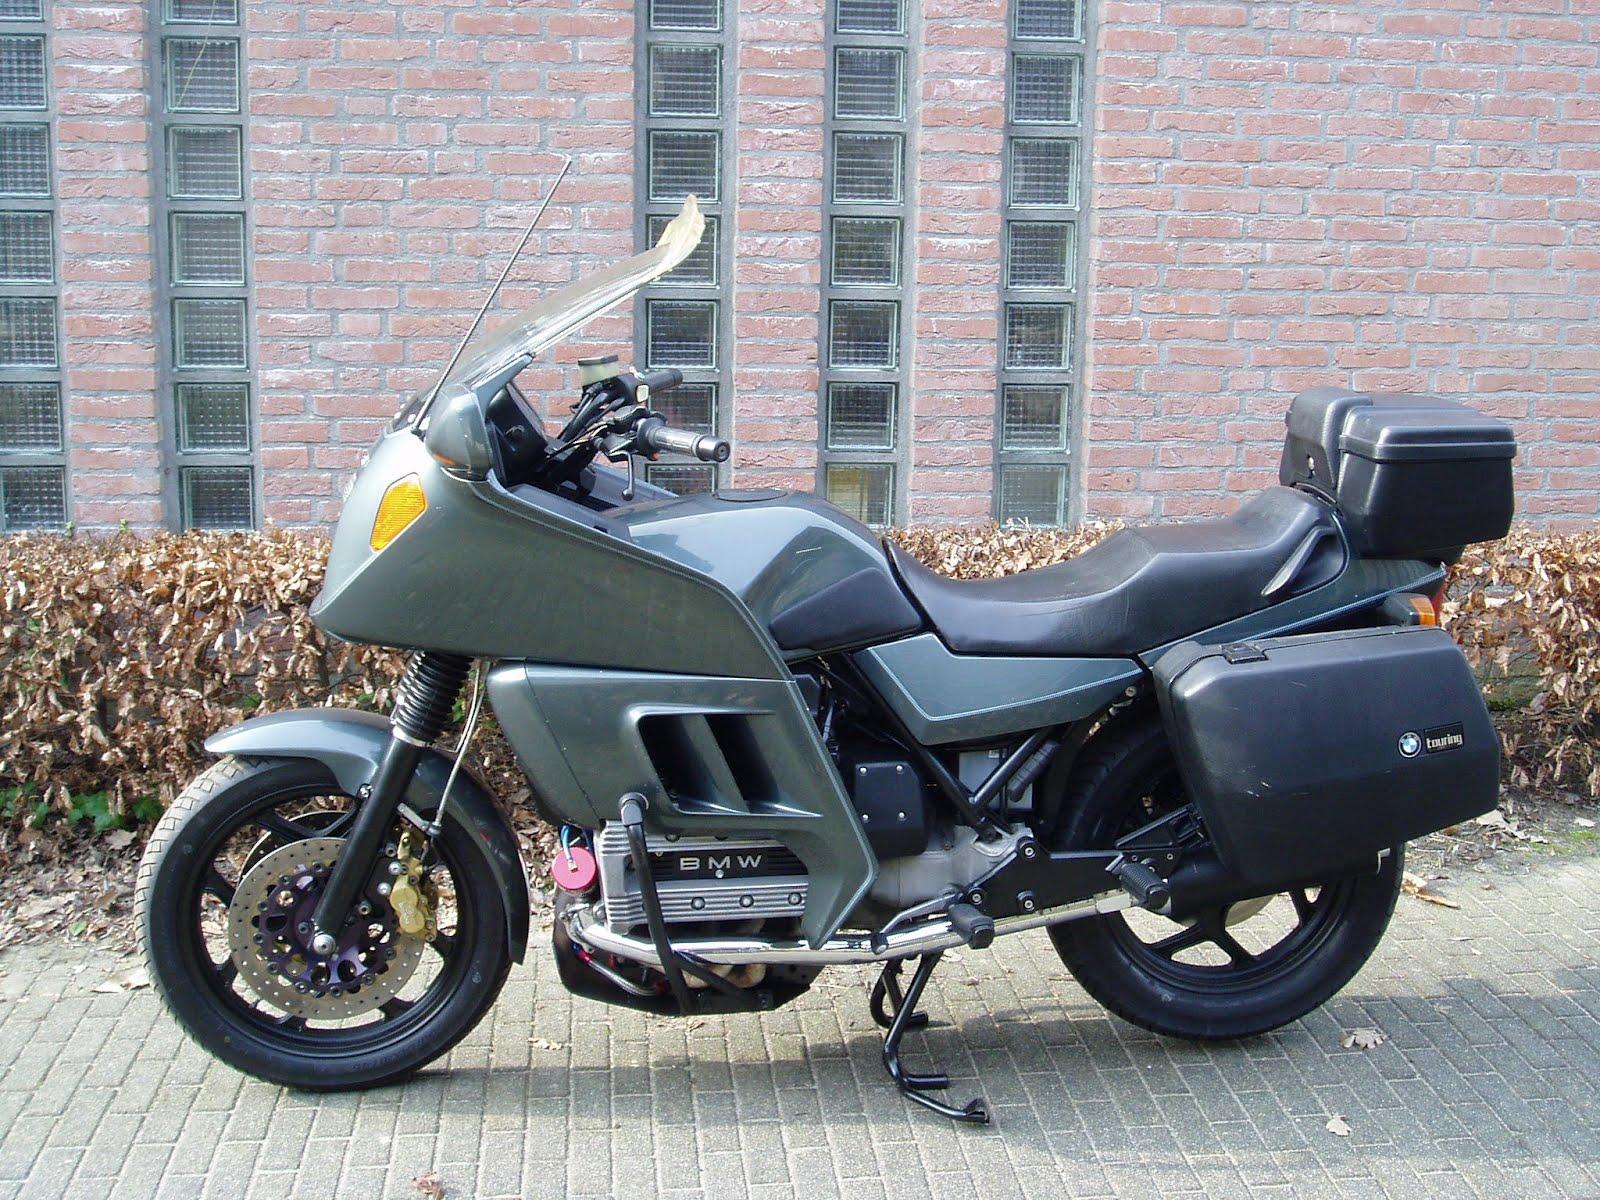 dd motorcycles bmw k 100 rt turbo. Black Bedroom Furniture Sets. Home Design Ideas